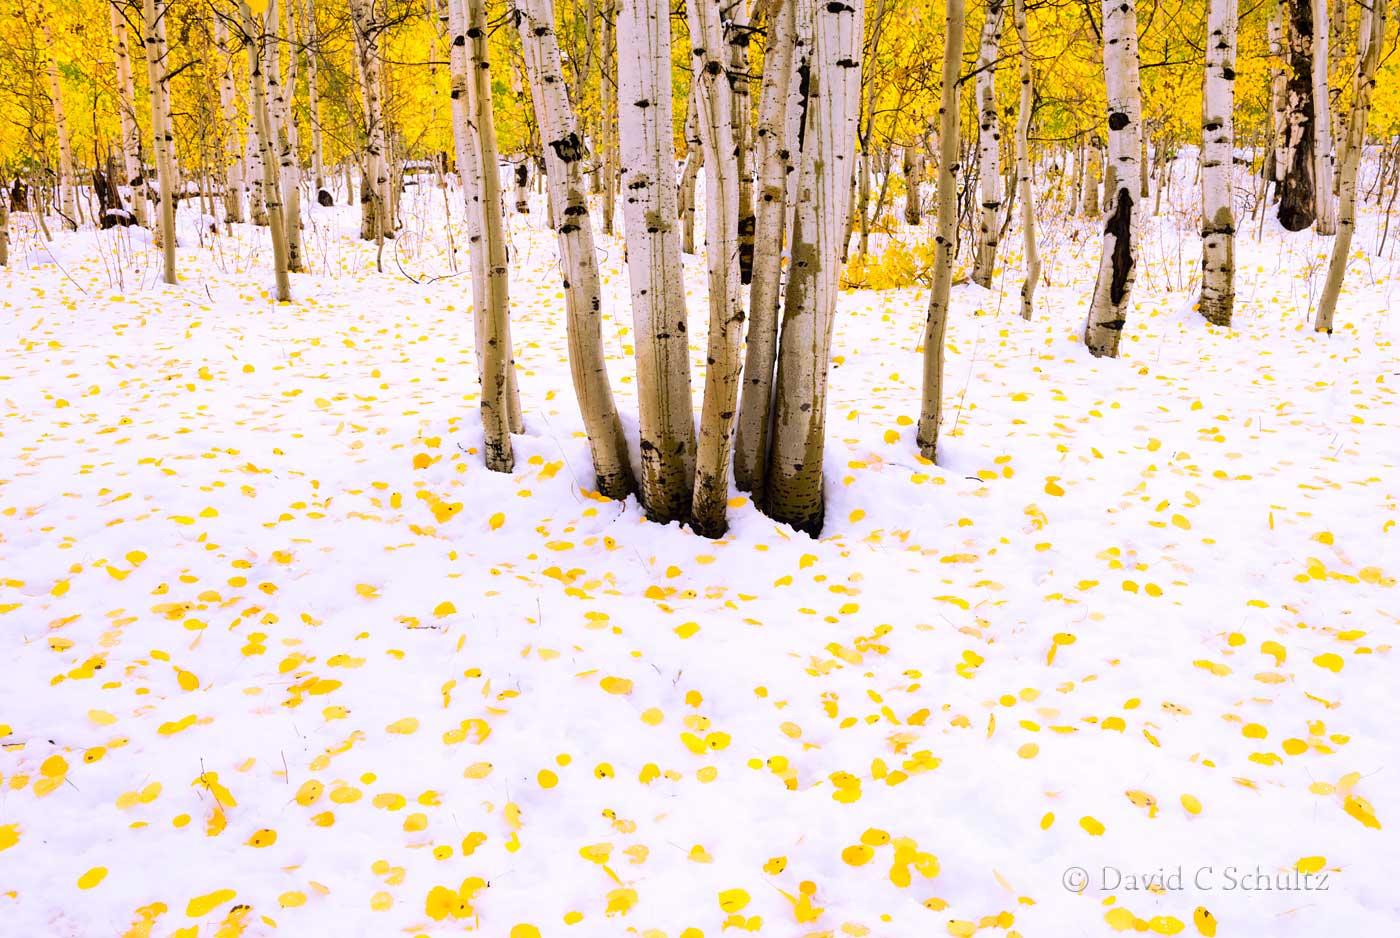 Aspen trees in the Uinta Mountains Utah - Image #3-10374